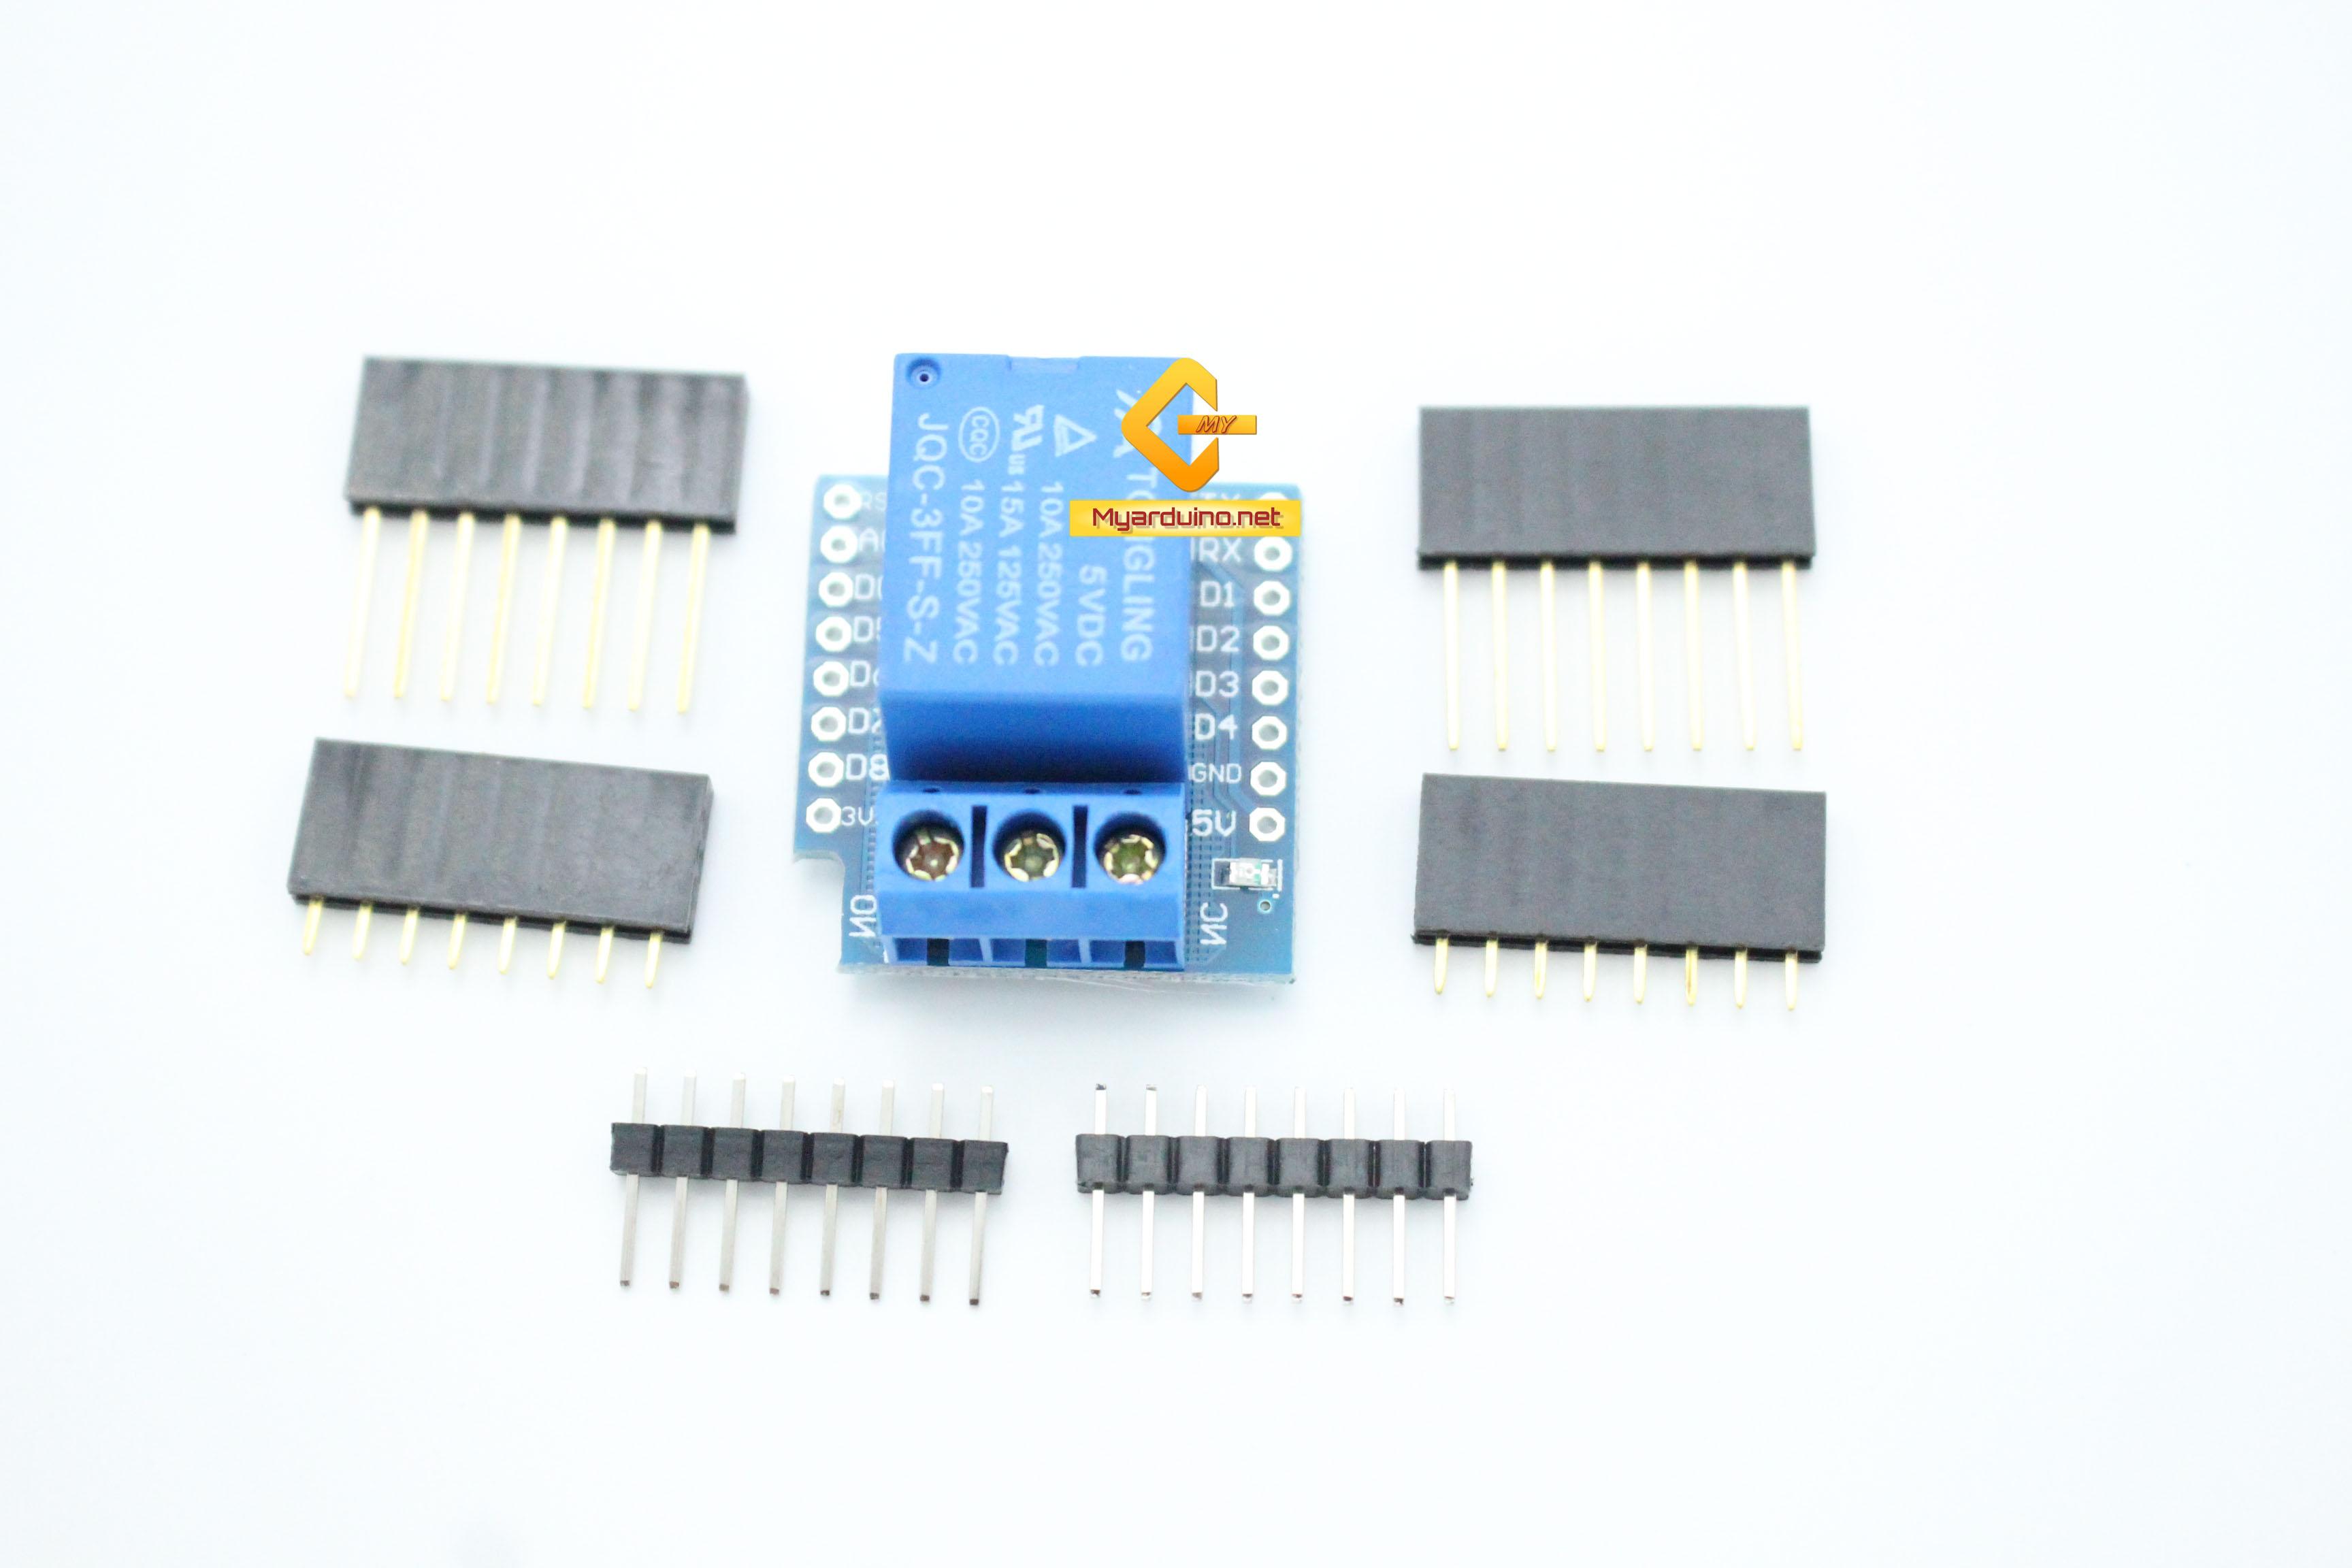 WeMos Relay Shield for WeMos D1 Mini